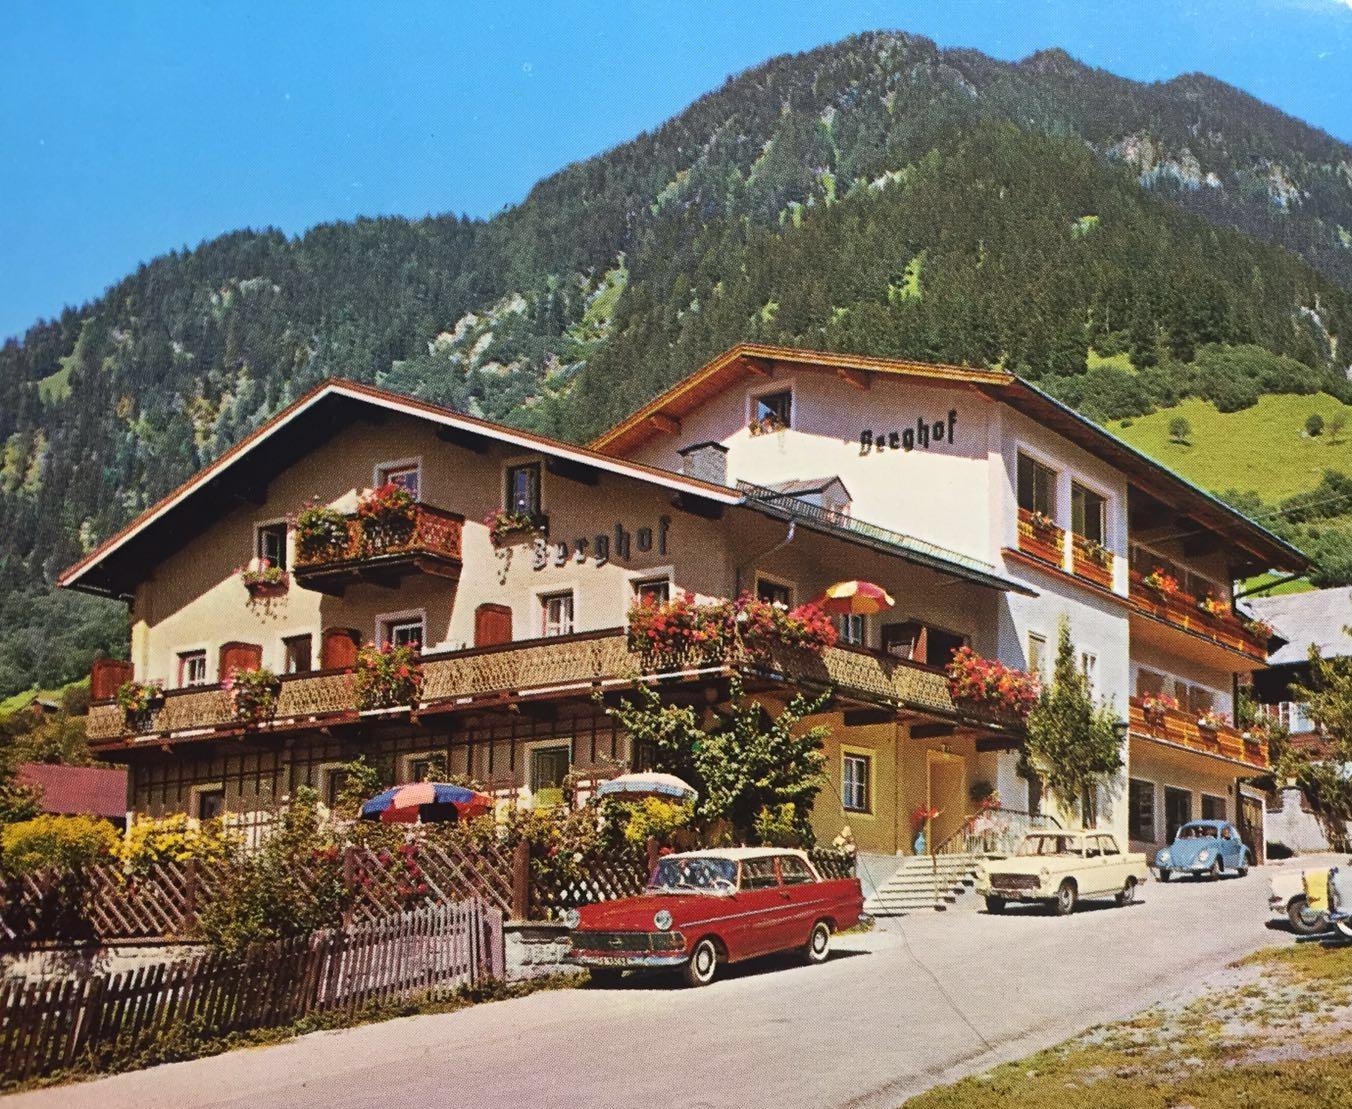 Der Berghof - 1972